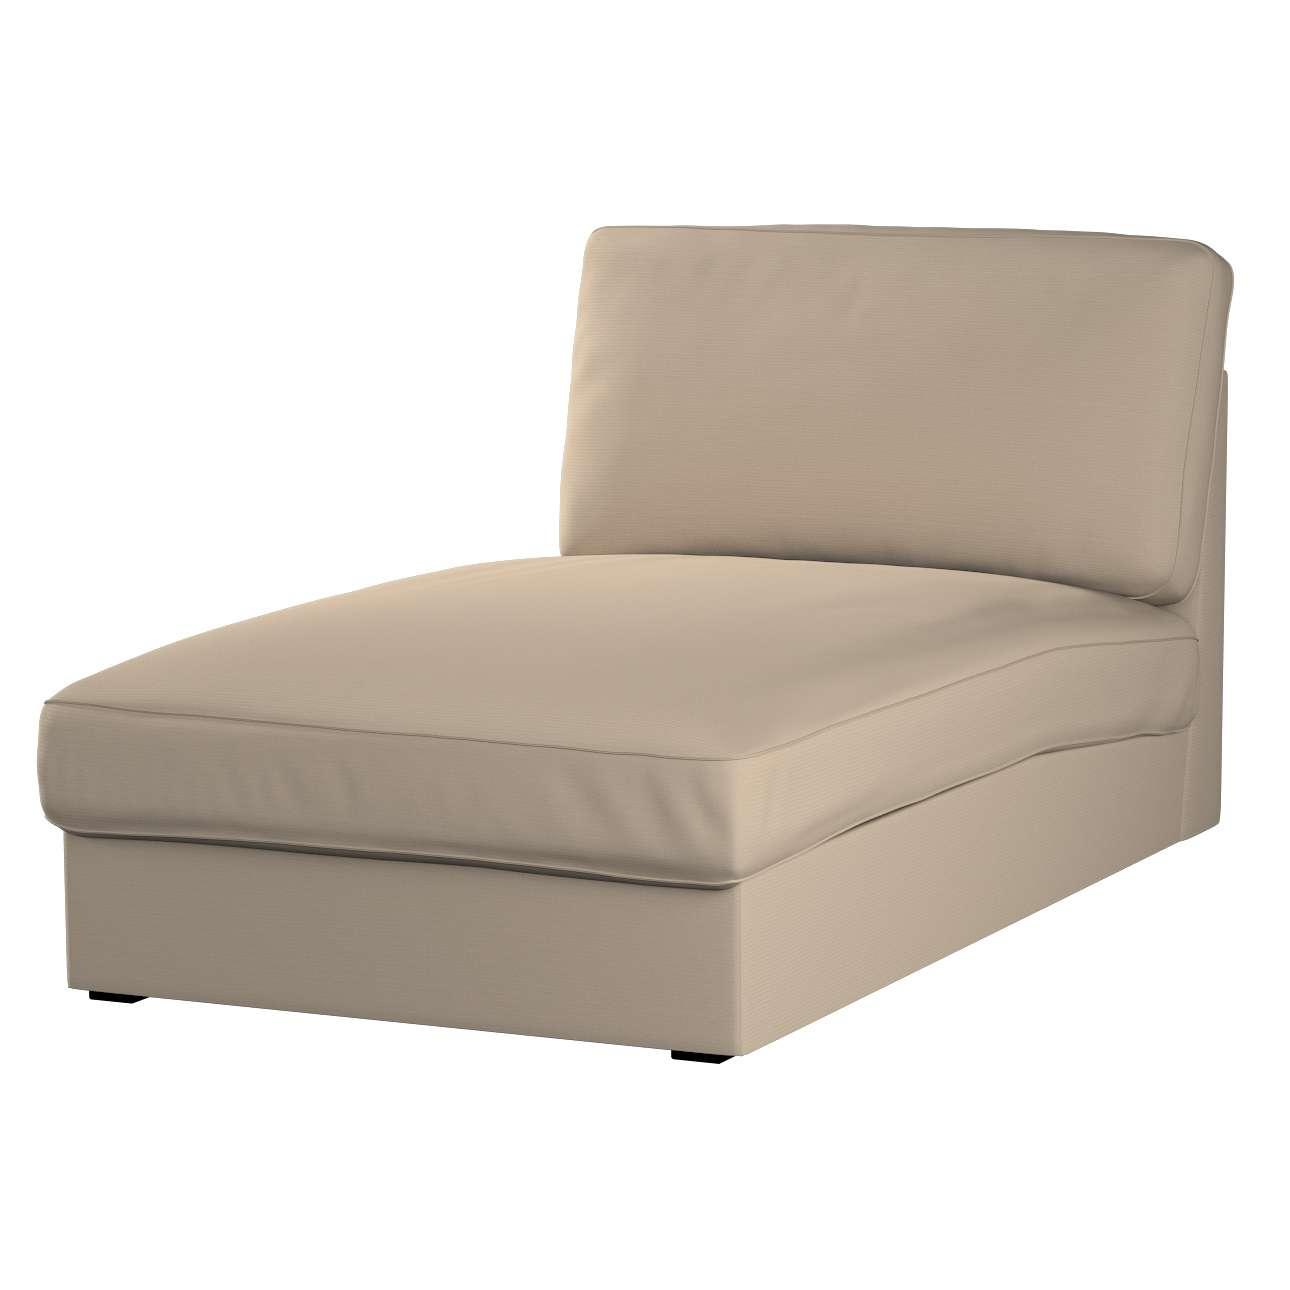 Kivik Recamiere Sofabezug Kivik Recamiere von der Kollektion Cotton Panama, Stoff: 702-28